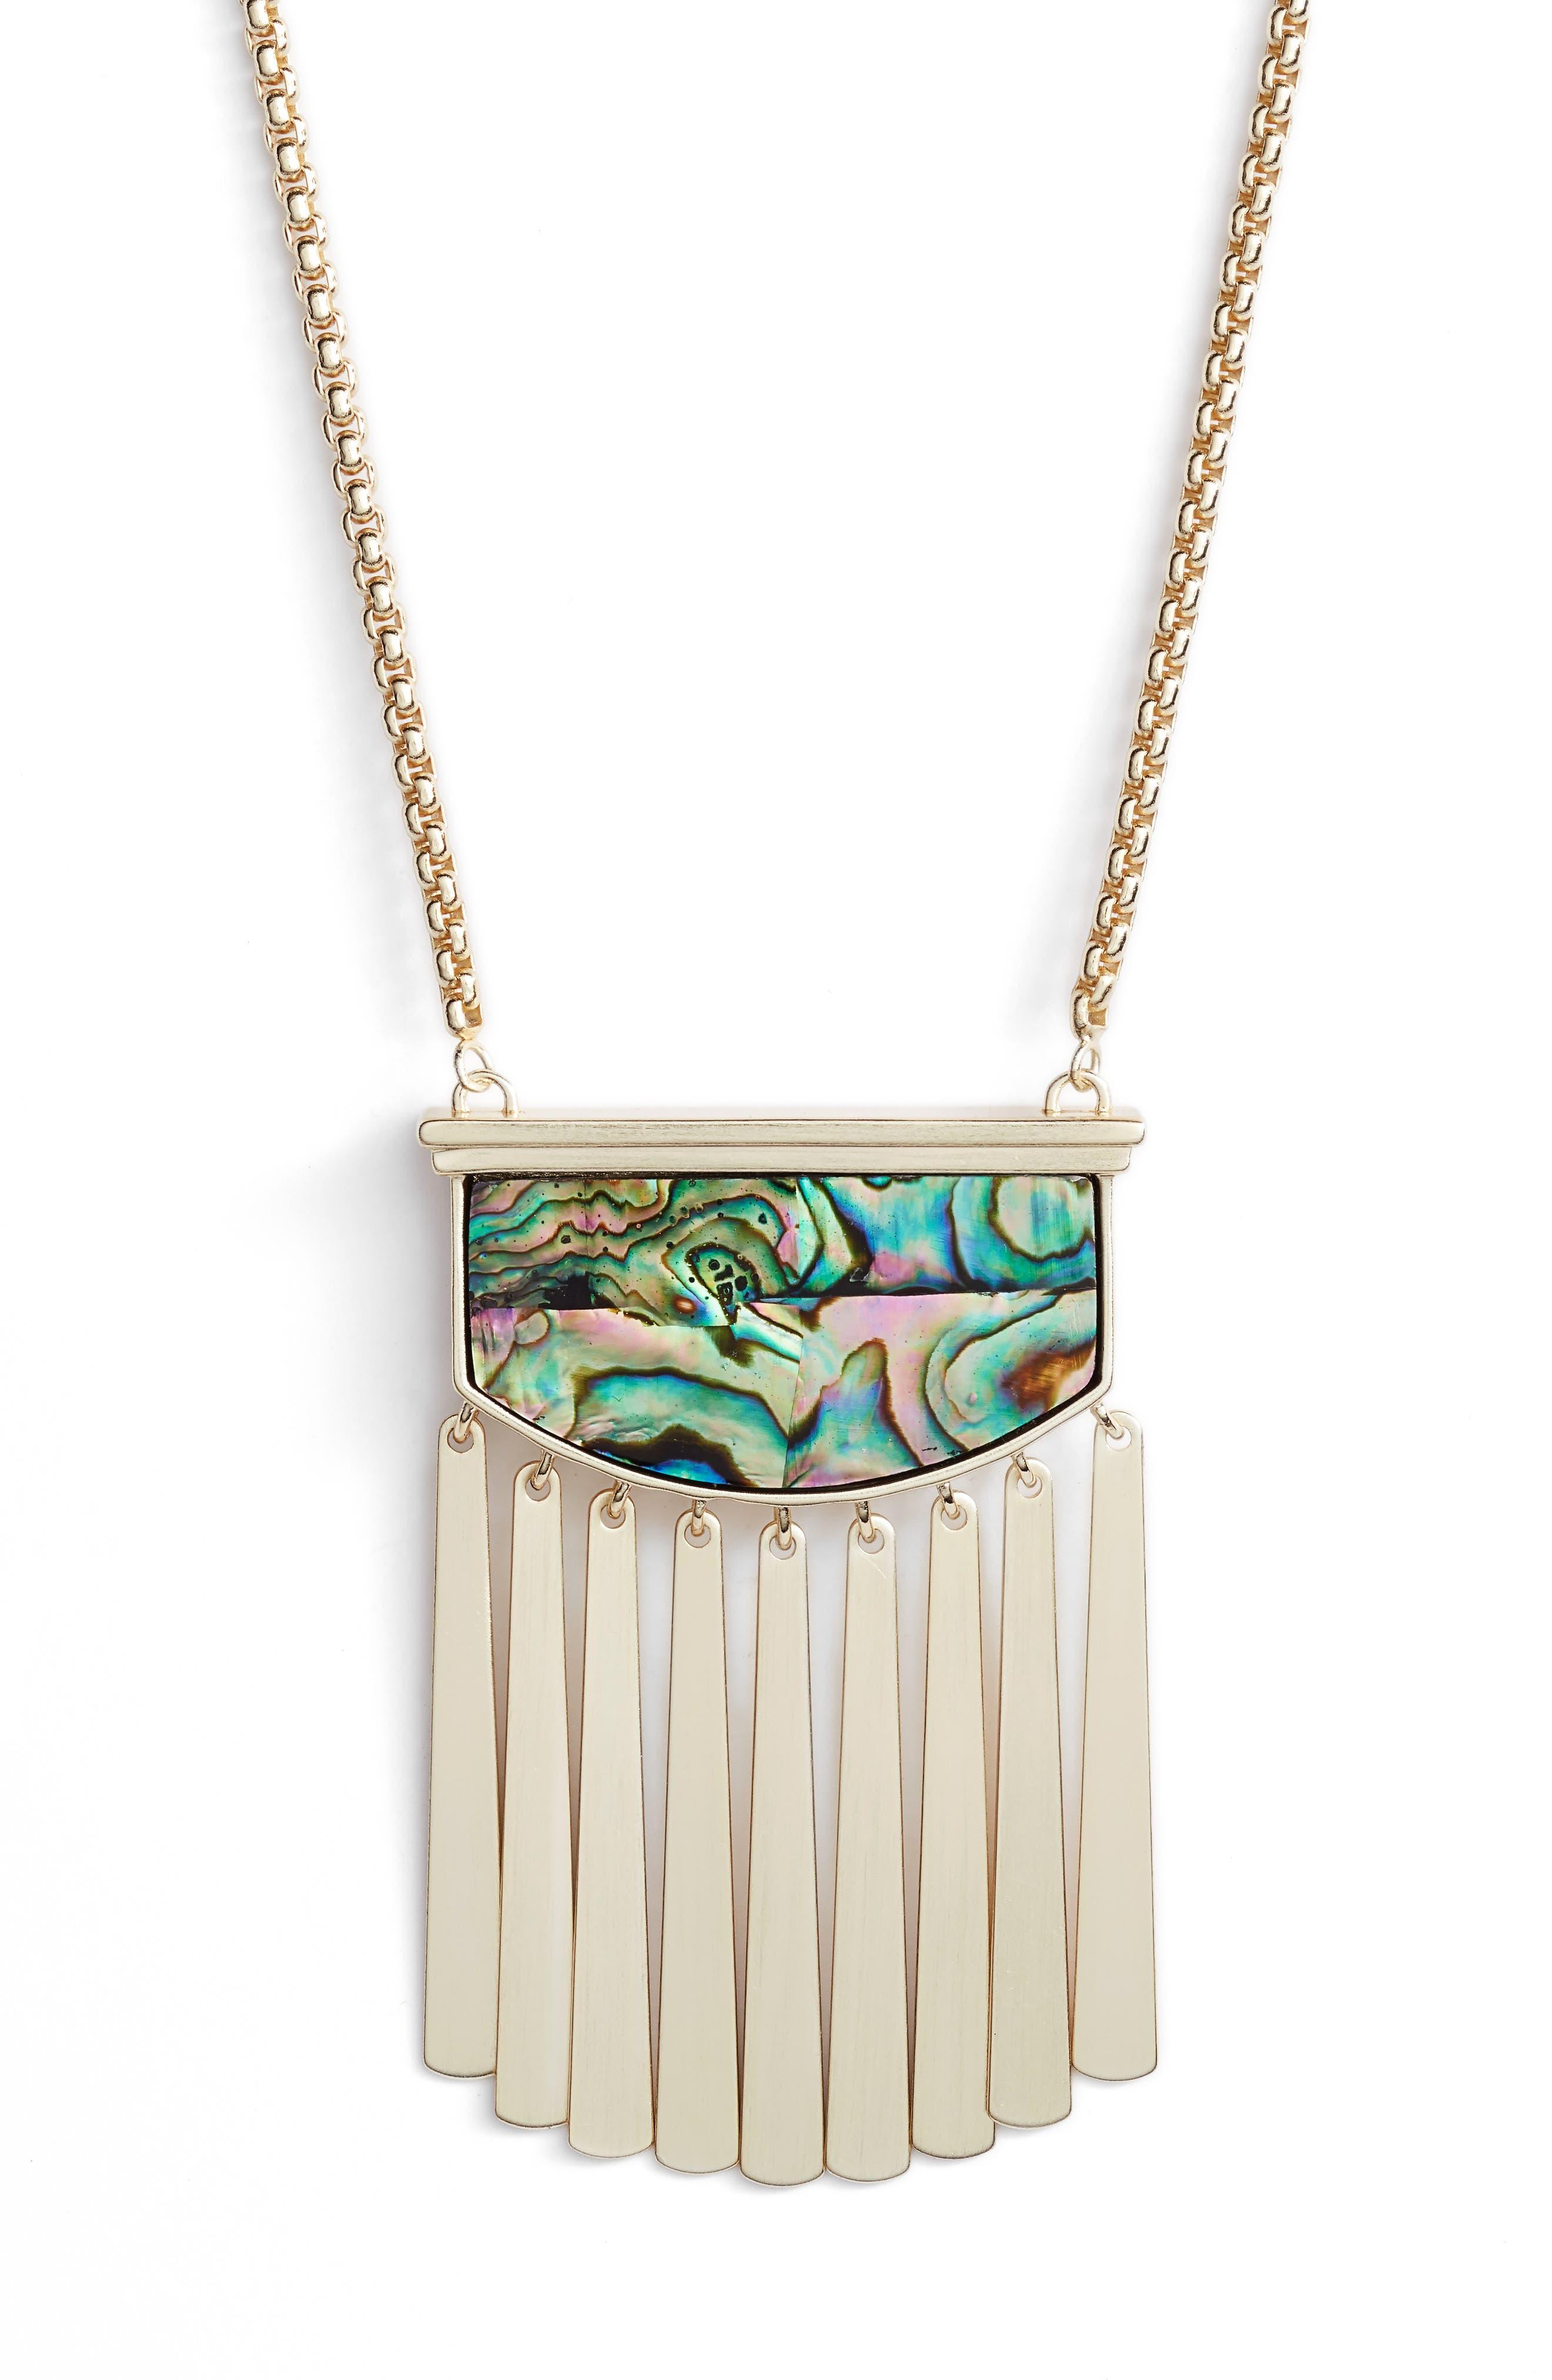 Ellen Stone Necklace,                             Alternate thumbnail 2, color,                             Abalone Shell/ Gold